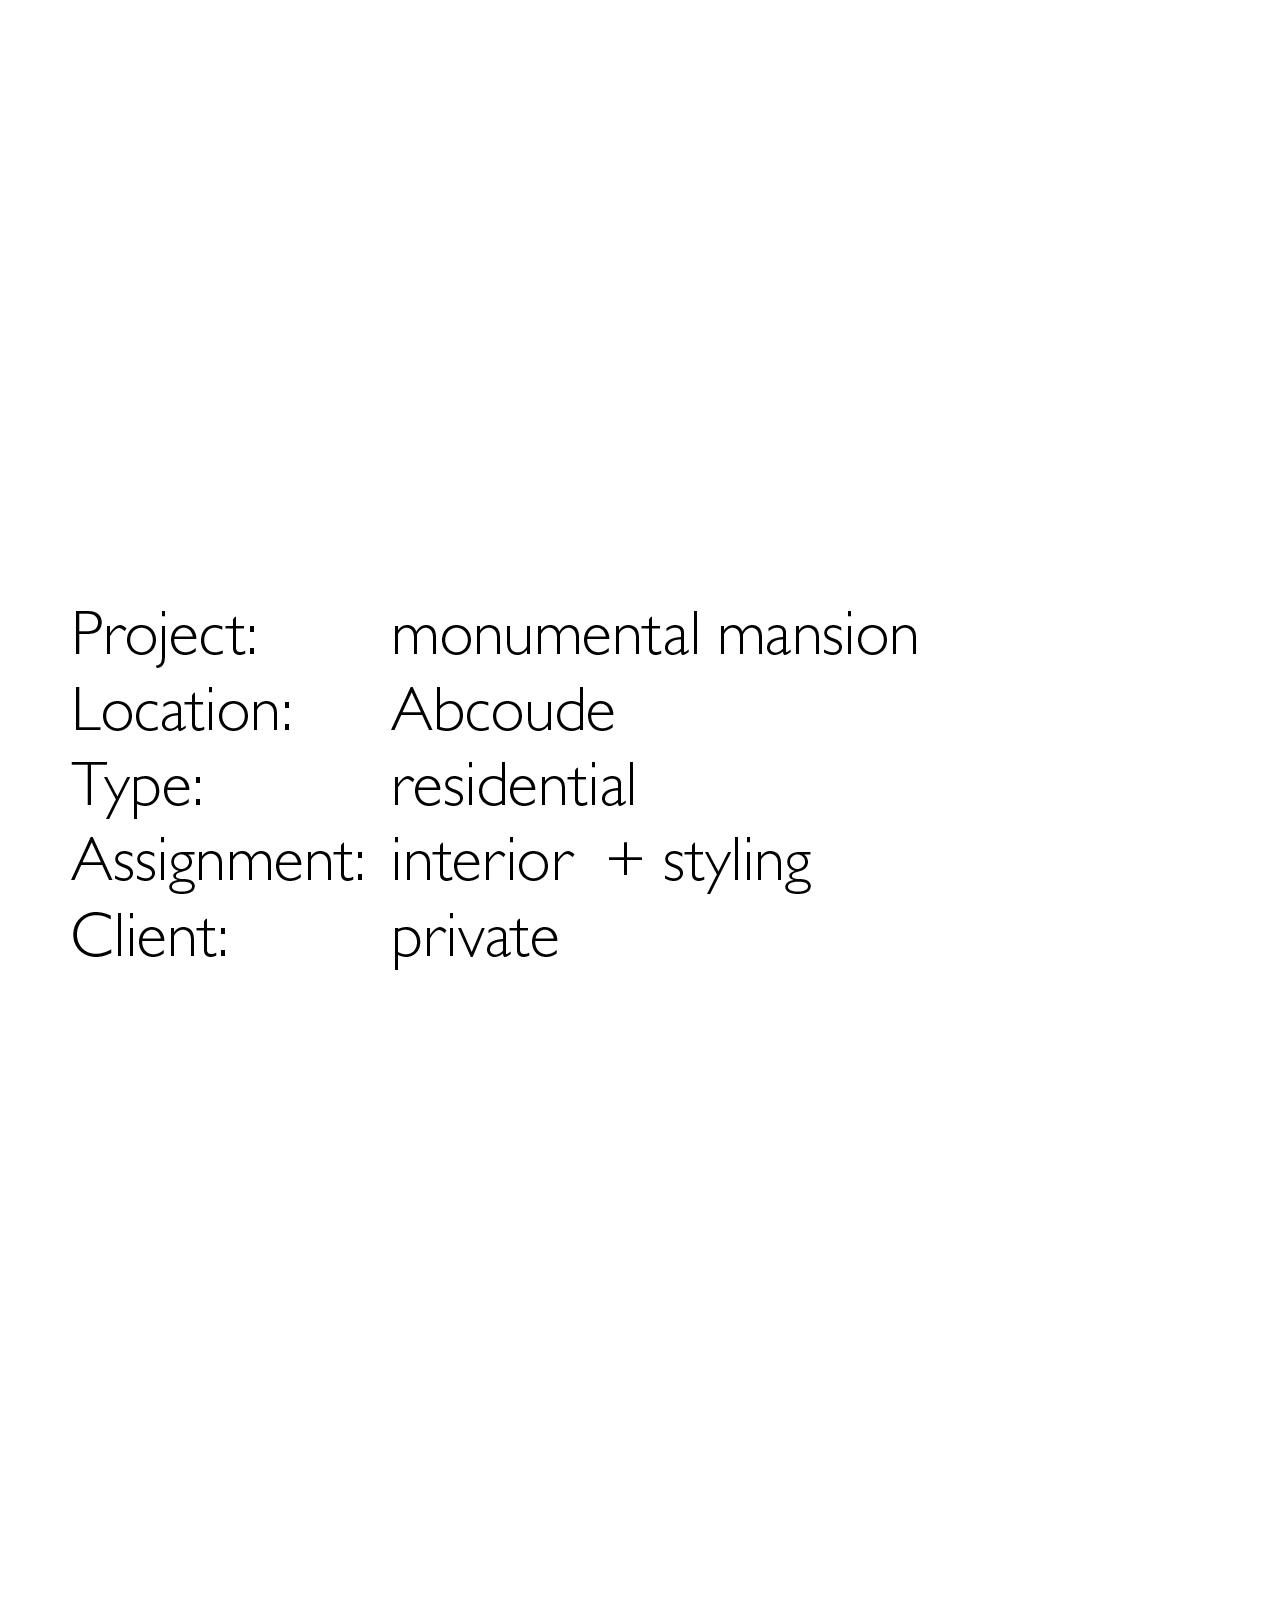 Abcoude-Projectinfo-website-JDN